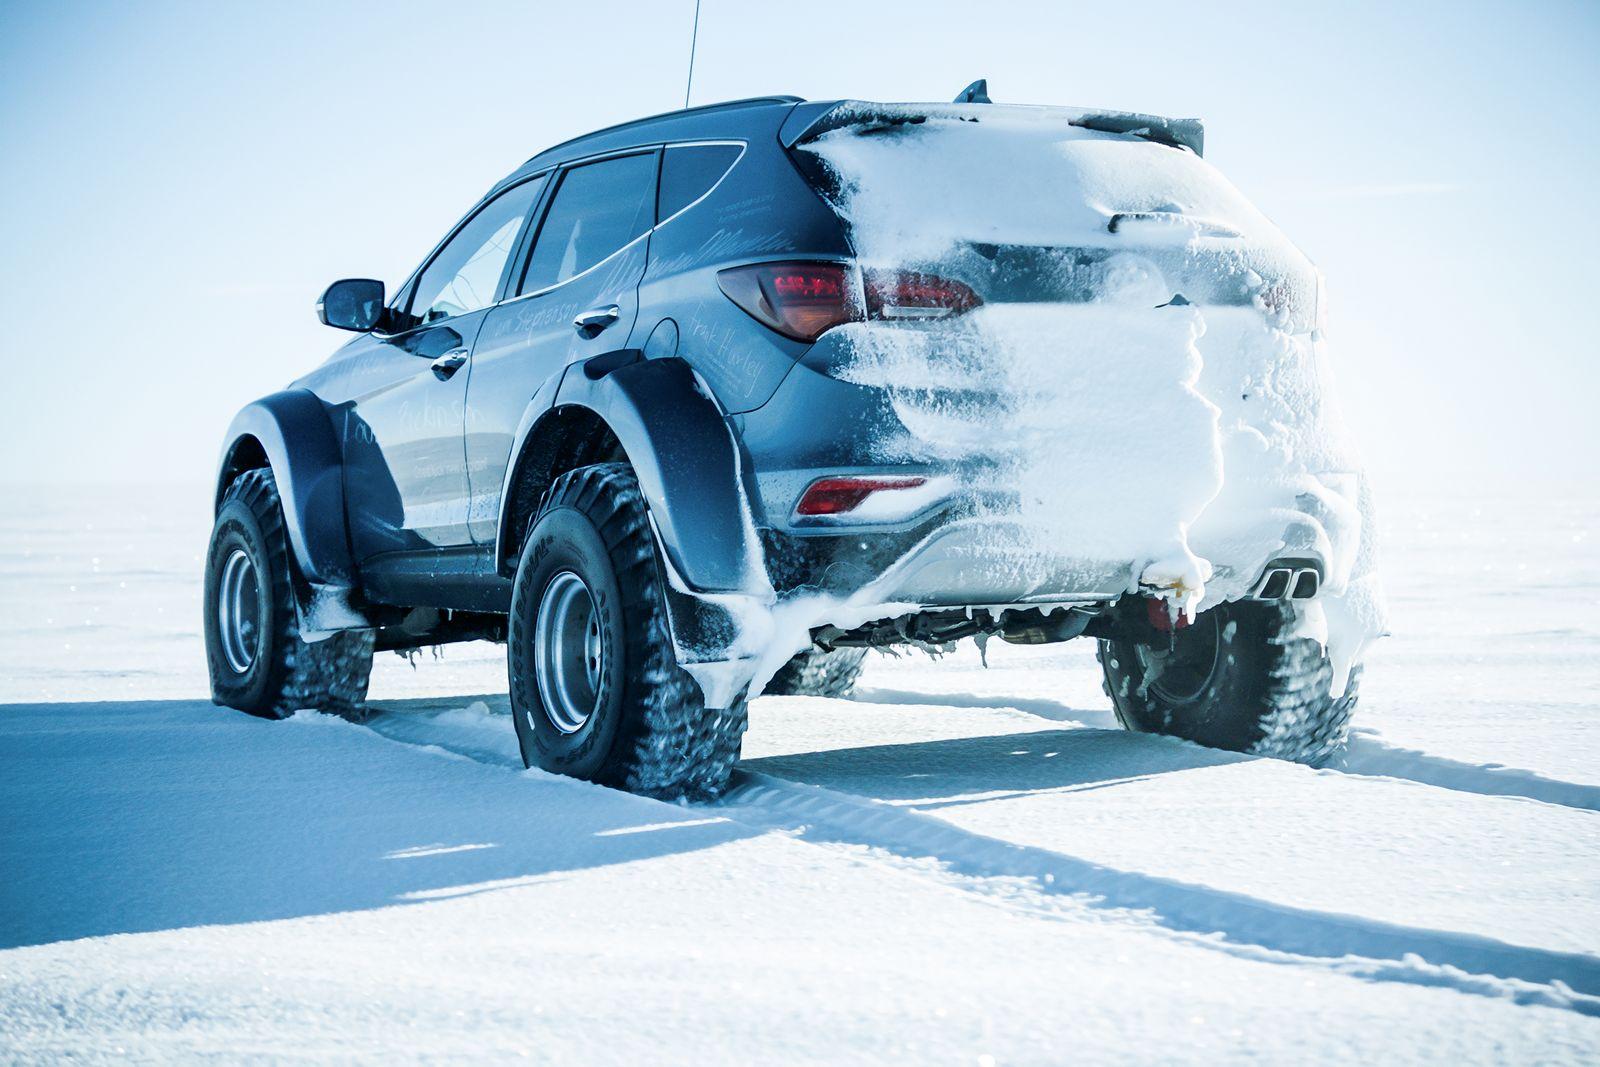 Hyundai-Santa-Fe-Antarctica-11